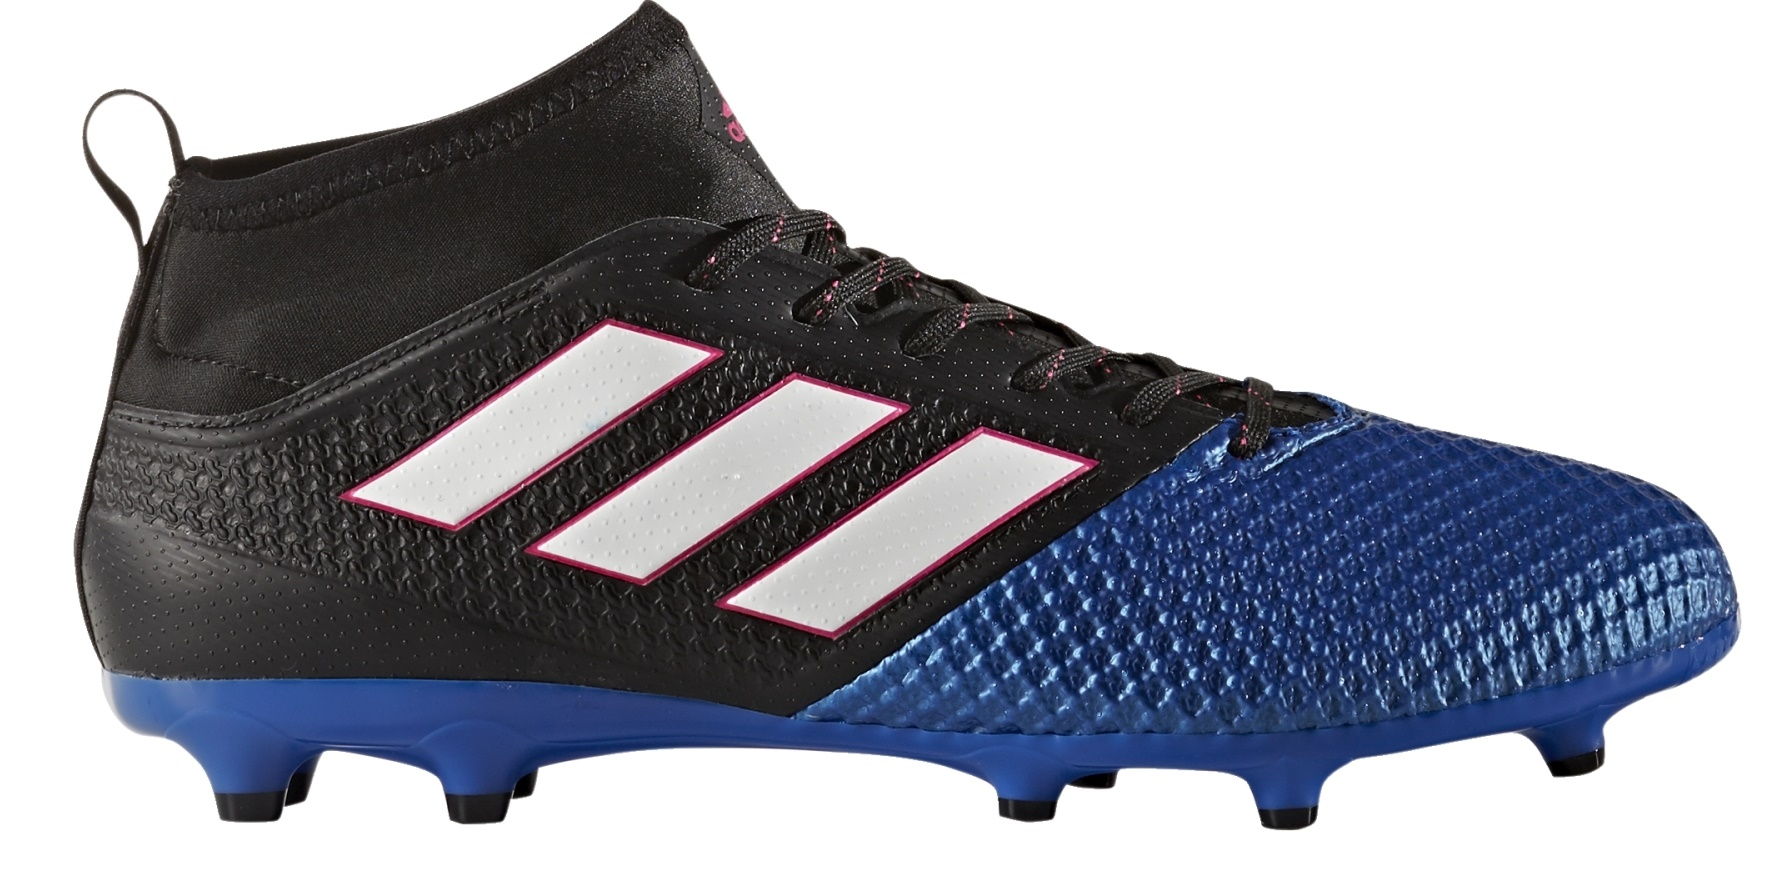 1adc6d247 Adidas Football boots Ace 17.3 PrimeMesh FG Blue Blast Pack colore Blue  Light blue - Adidas - SportIT.com